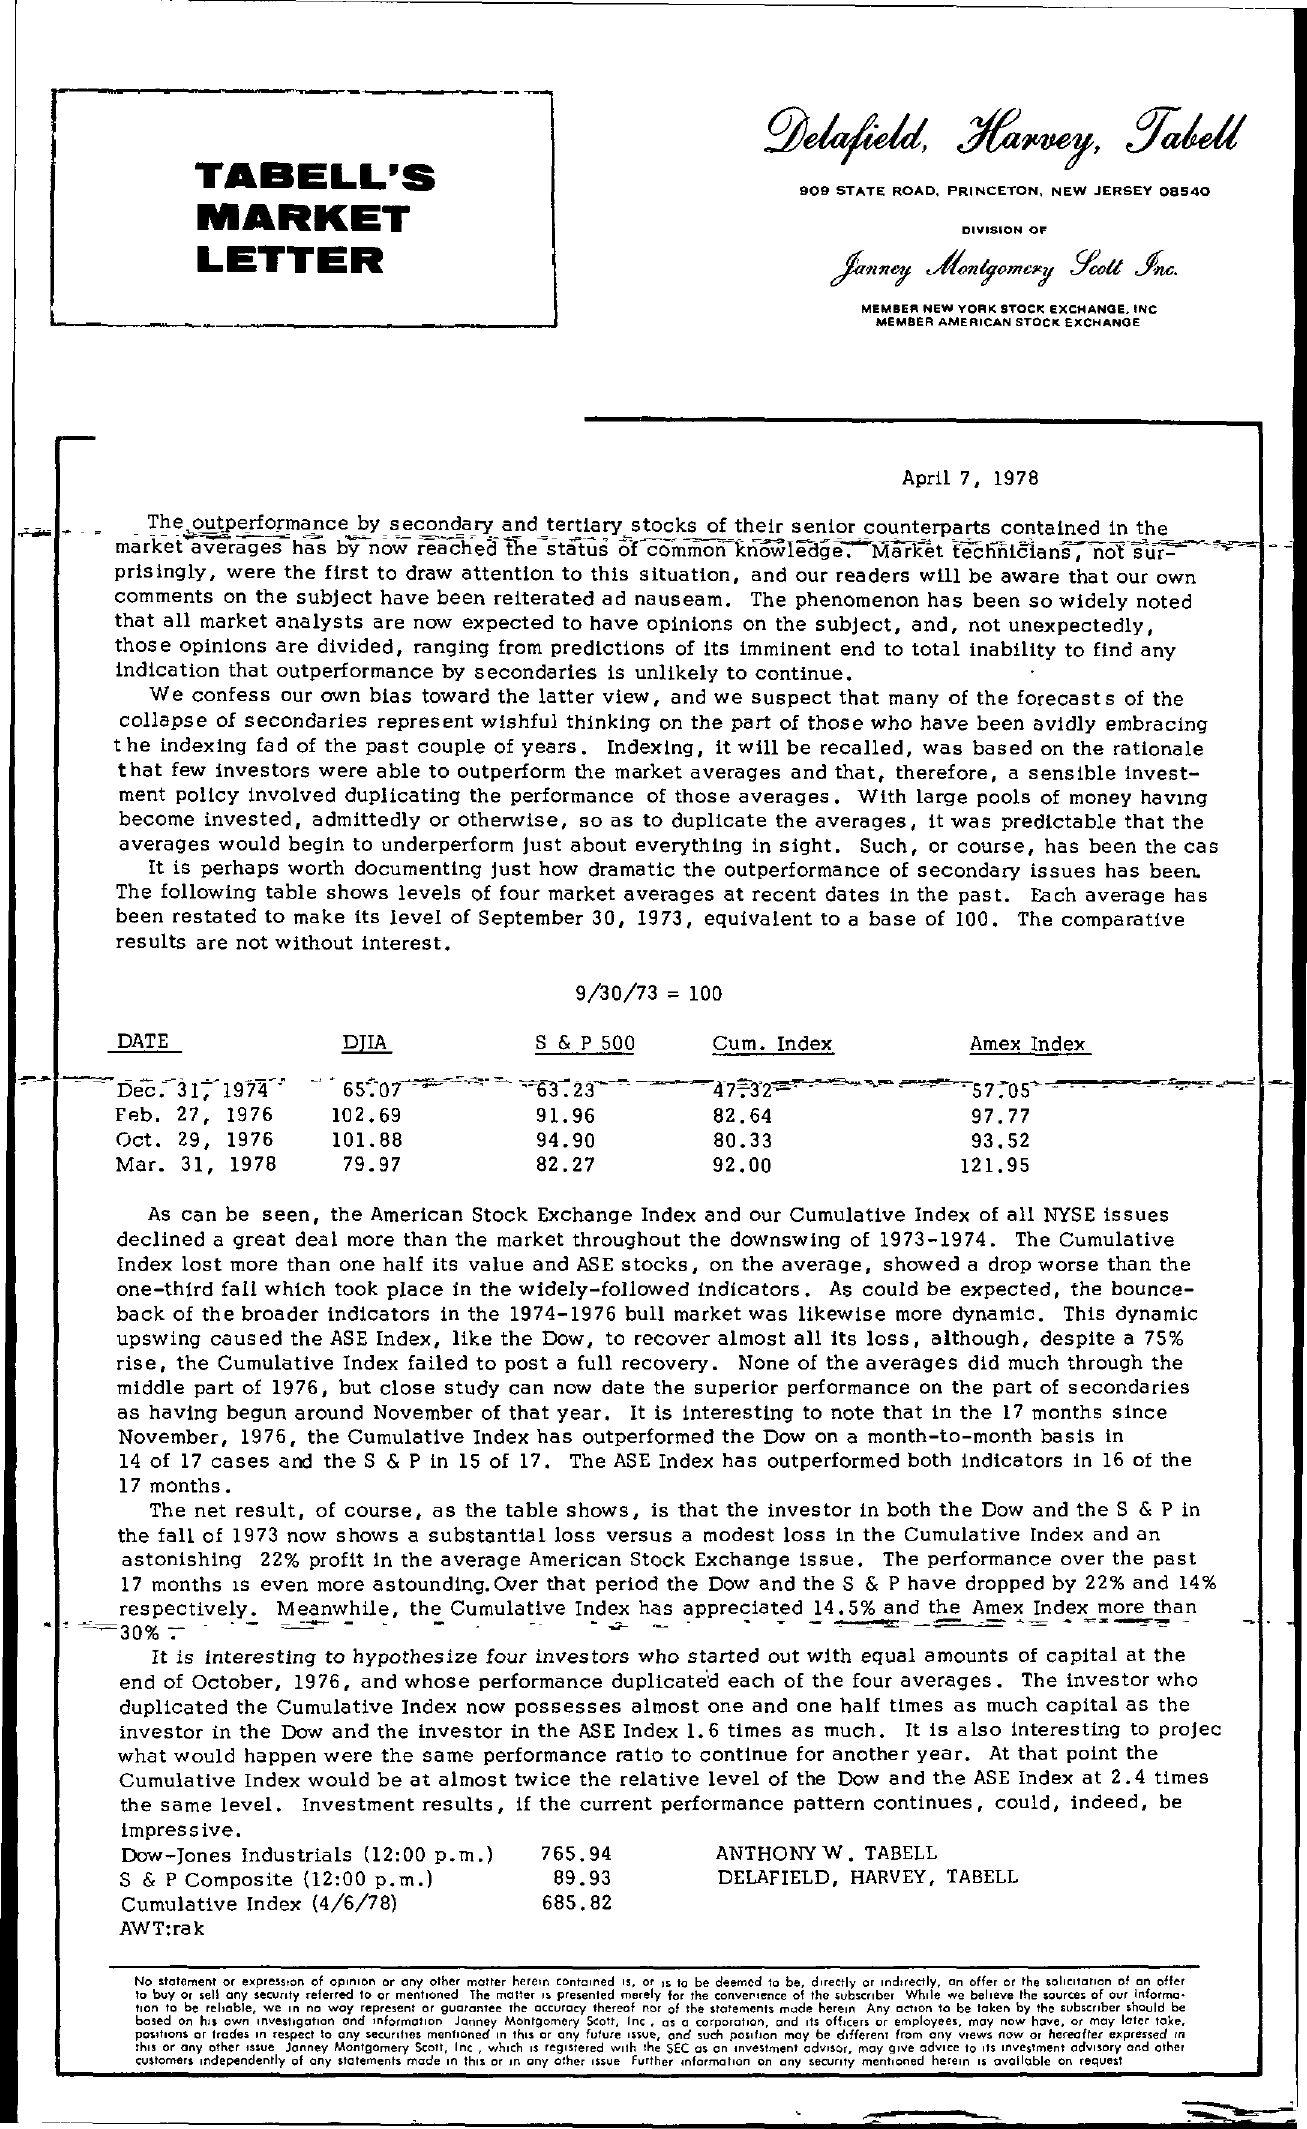 Tabell's Market Letter - April 07, 1978